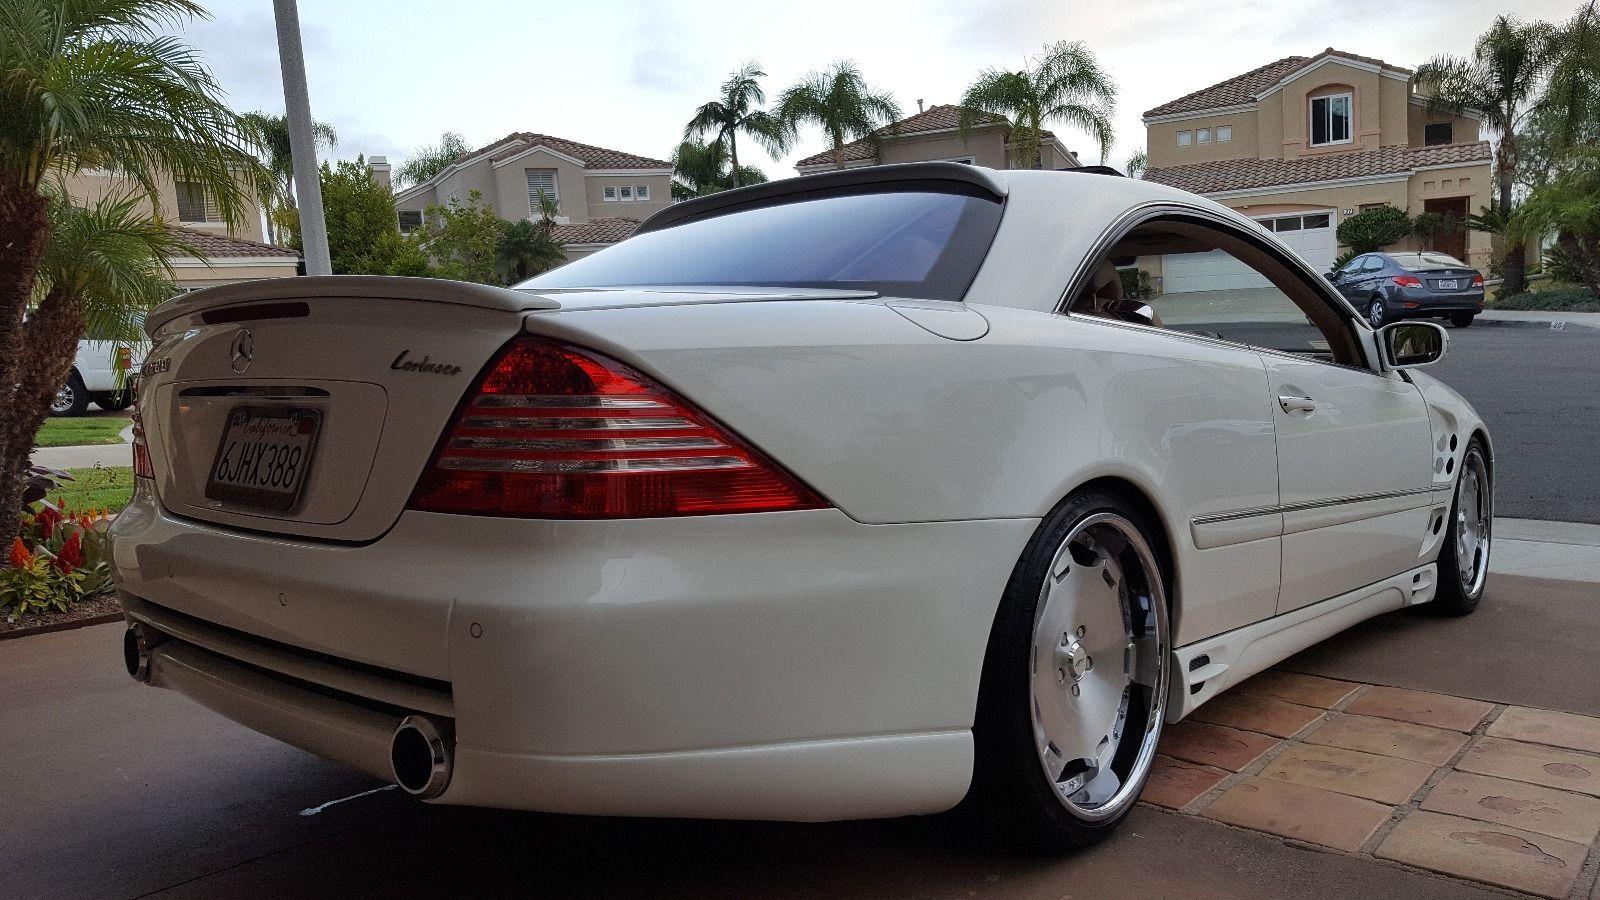 2002 mercedes benz w215 cl500 on 20 avus wheels benztuning for Mercedes benz cl500